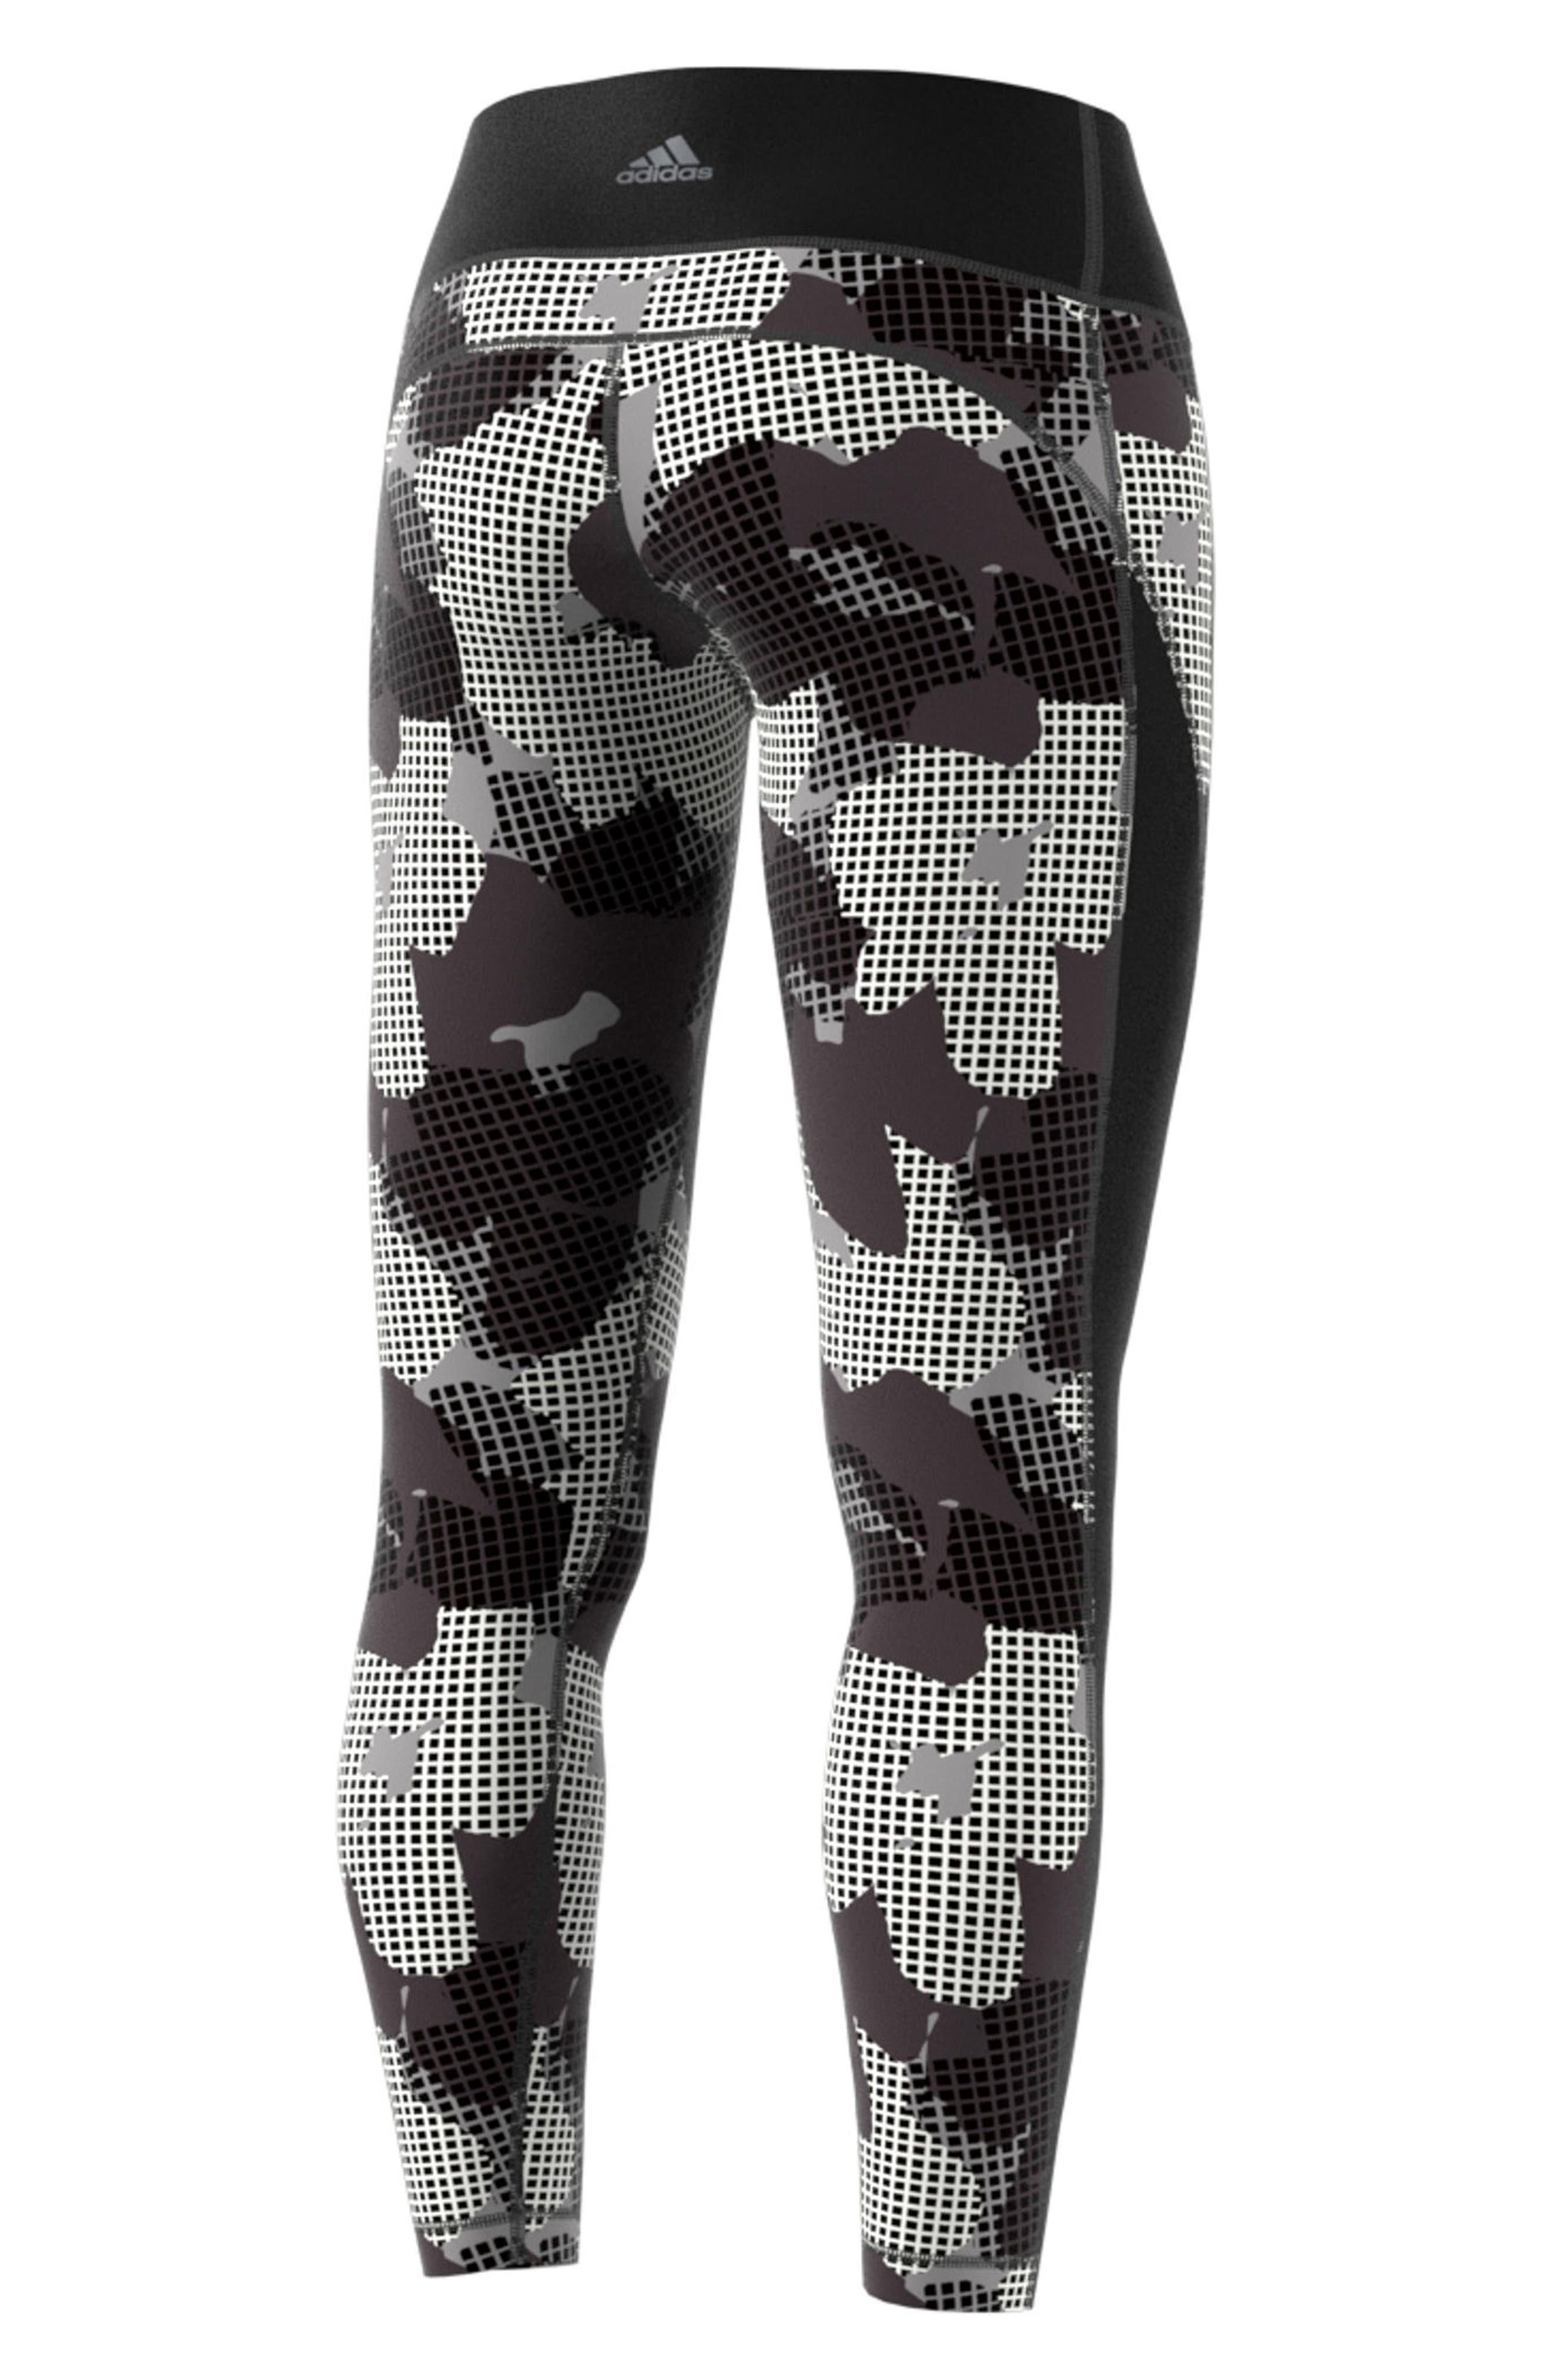 Heatracer Leggings,                             Alternate thumbnail 7, color,                             BLACK/ PRINT